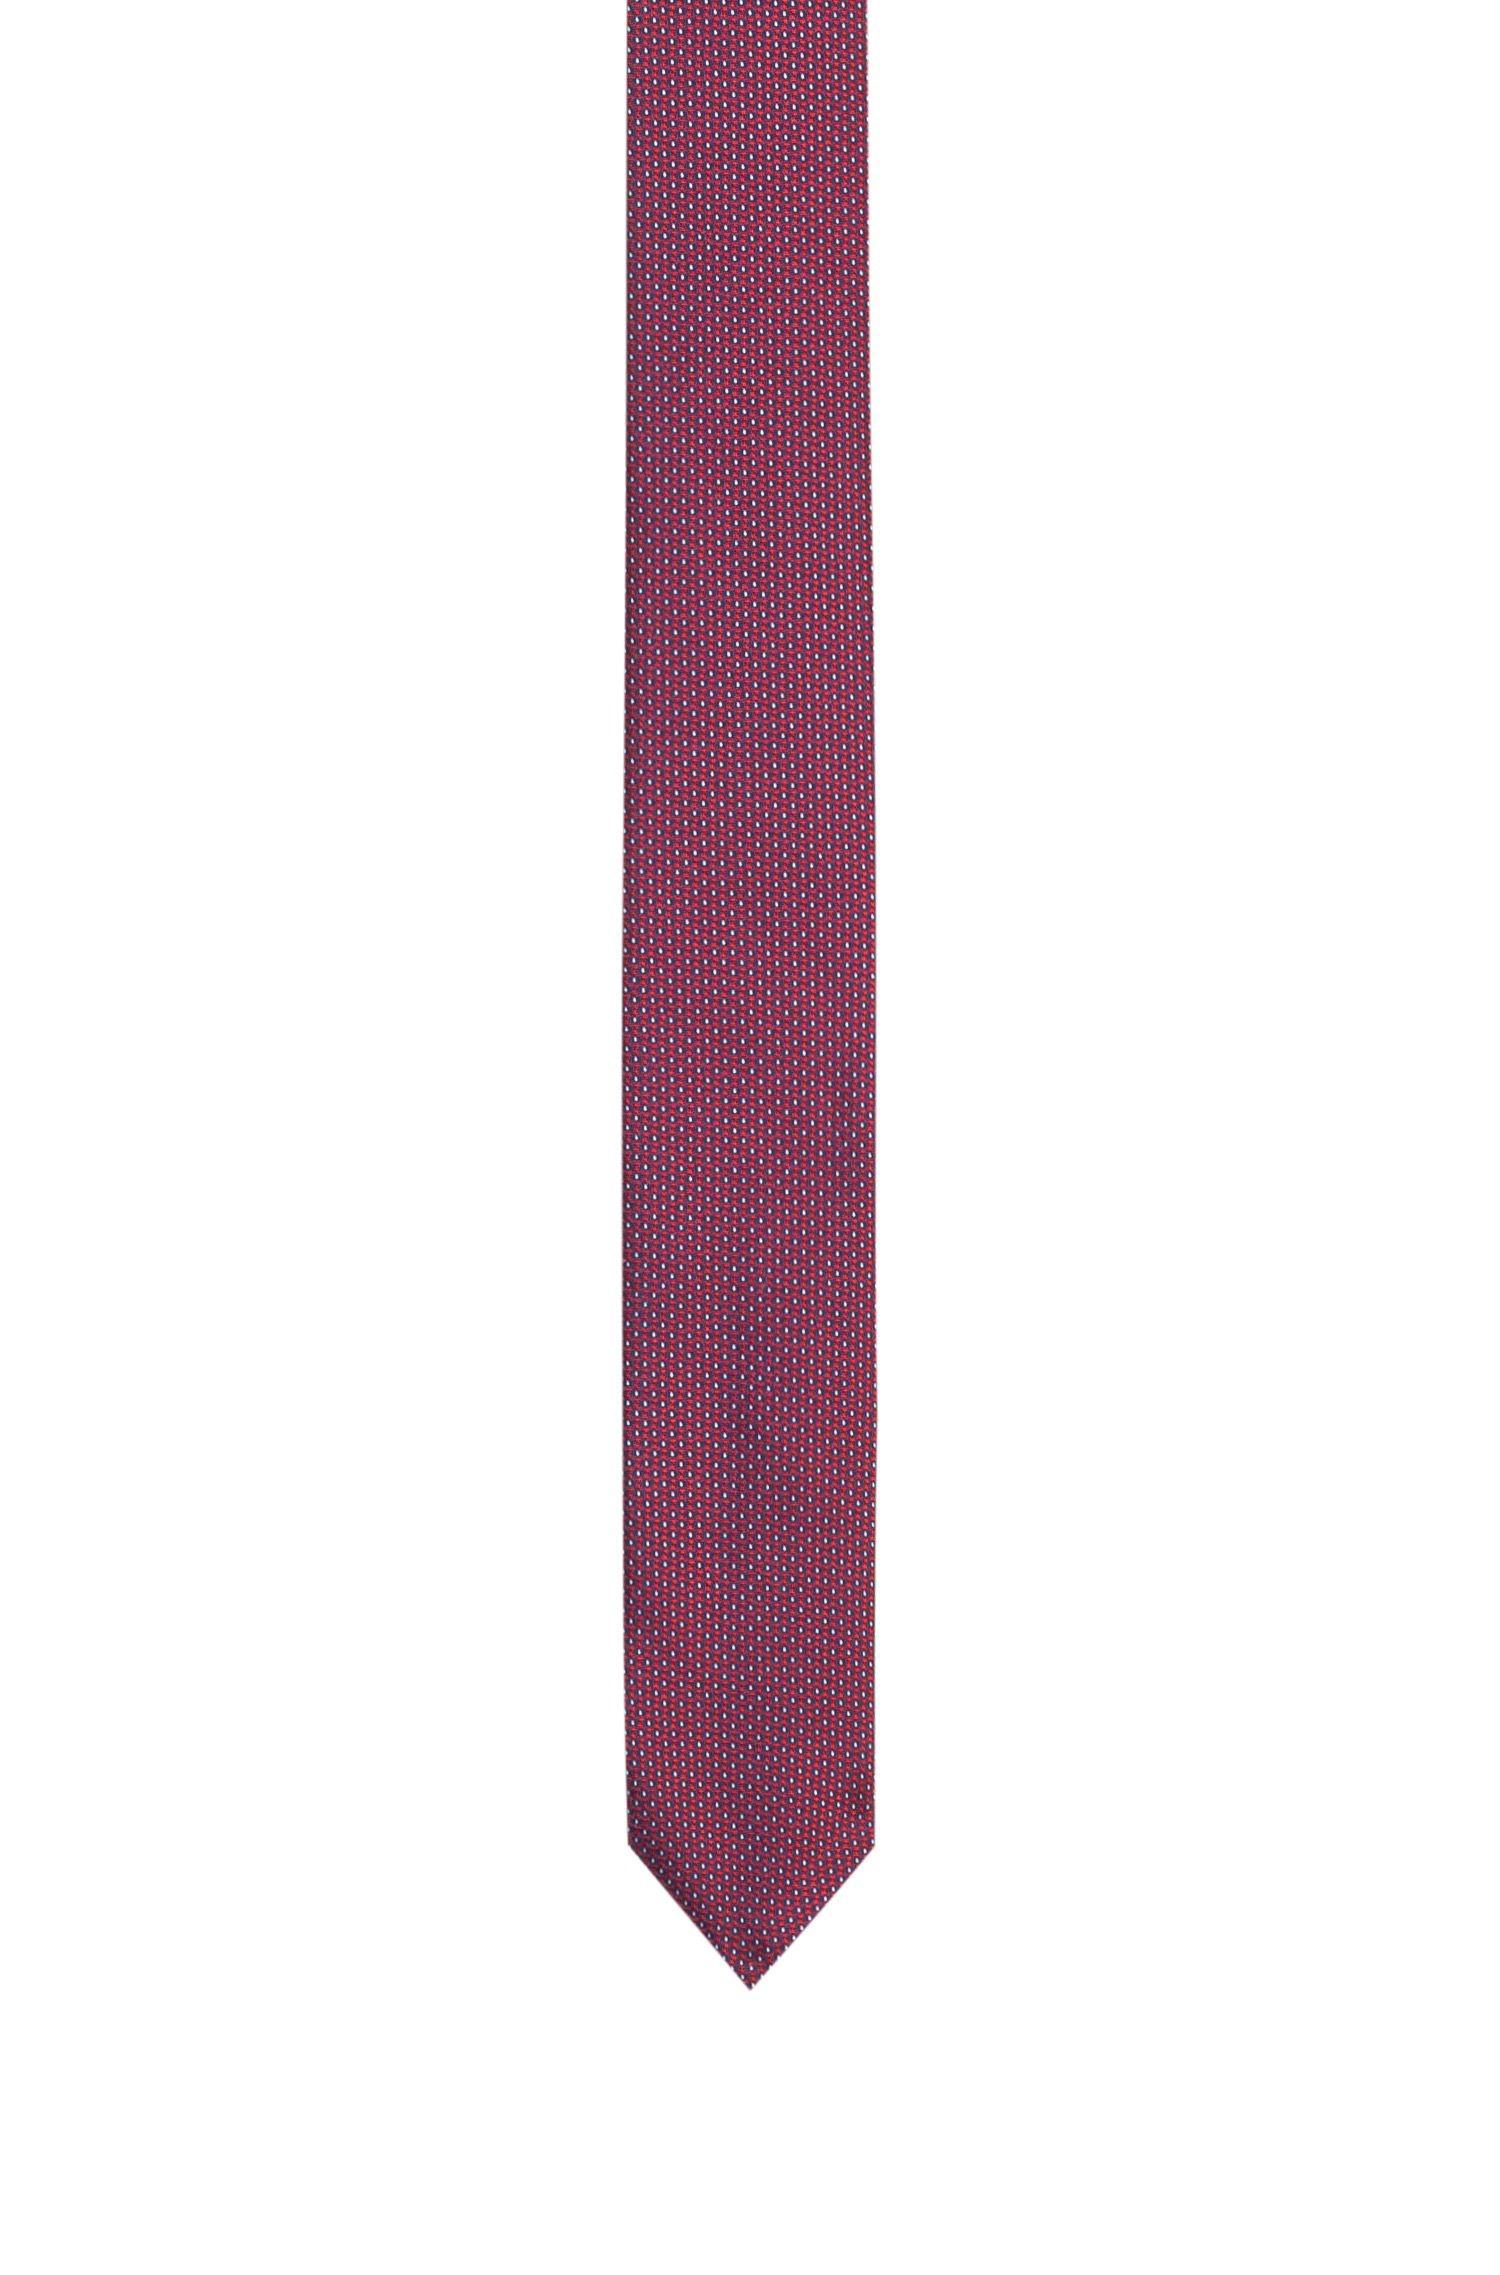 Hugo Boss - Gerade geschnittene Krawatte aus Seide mit dezentem Muster - 1